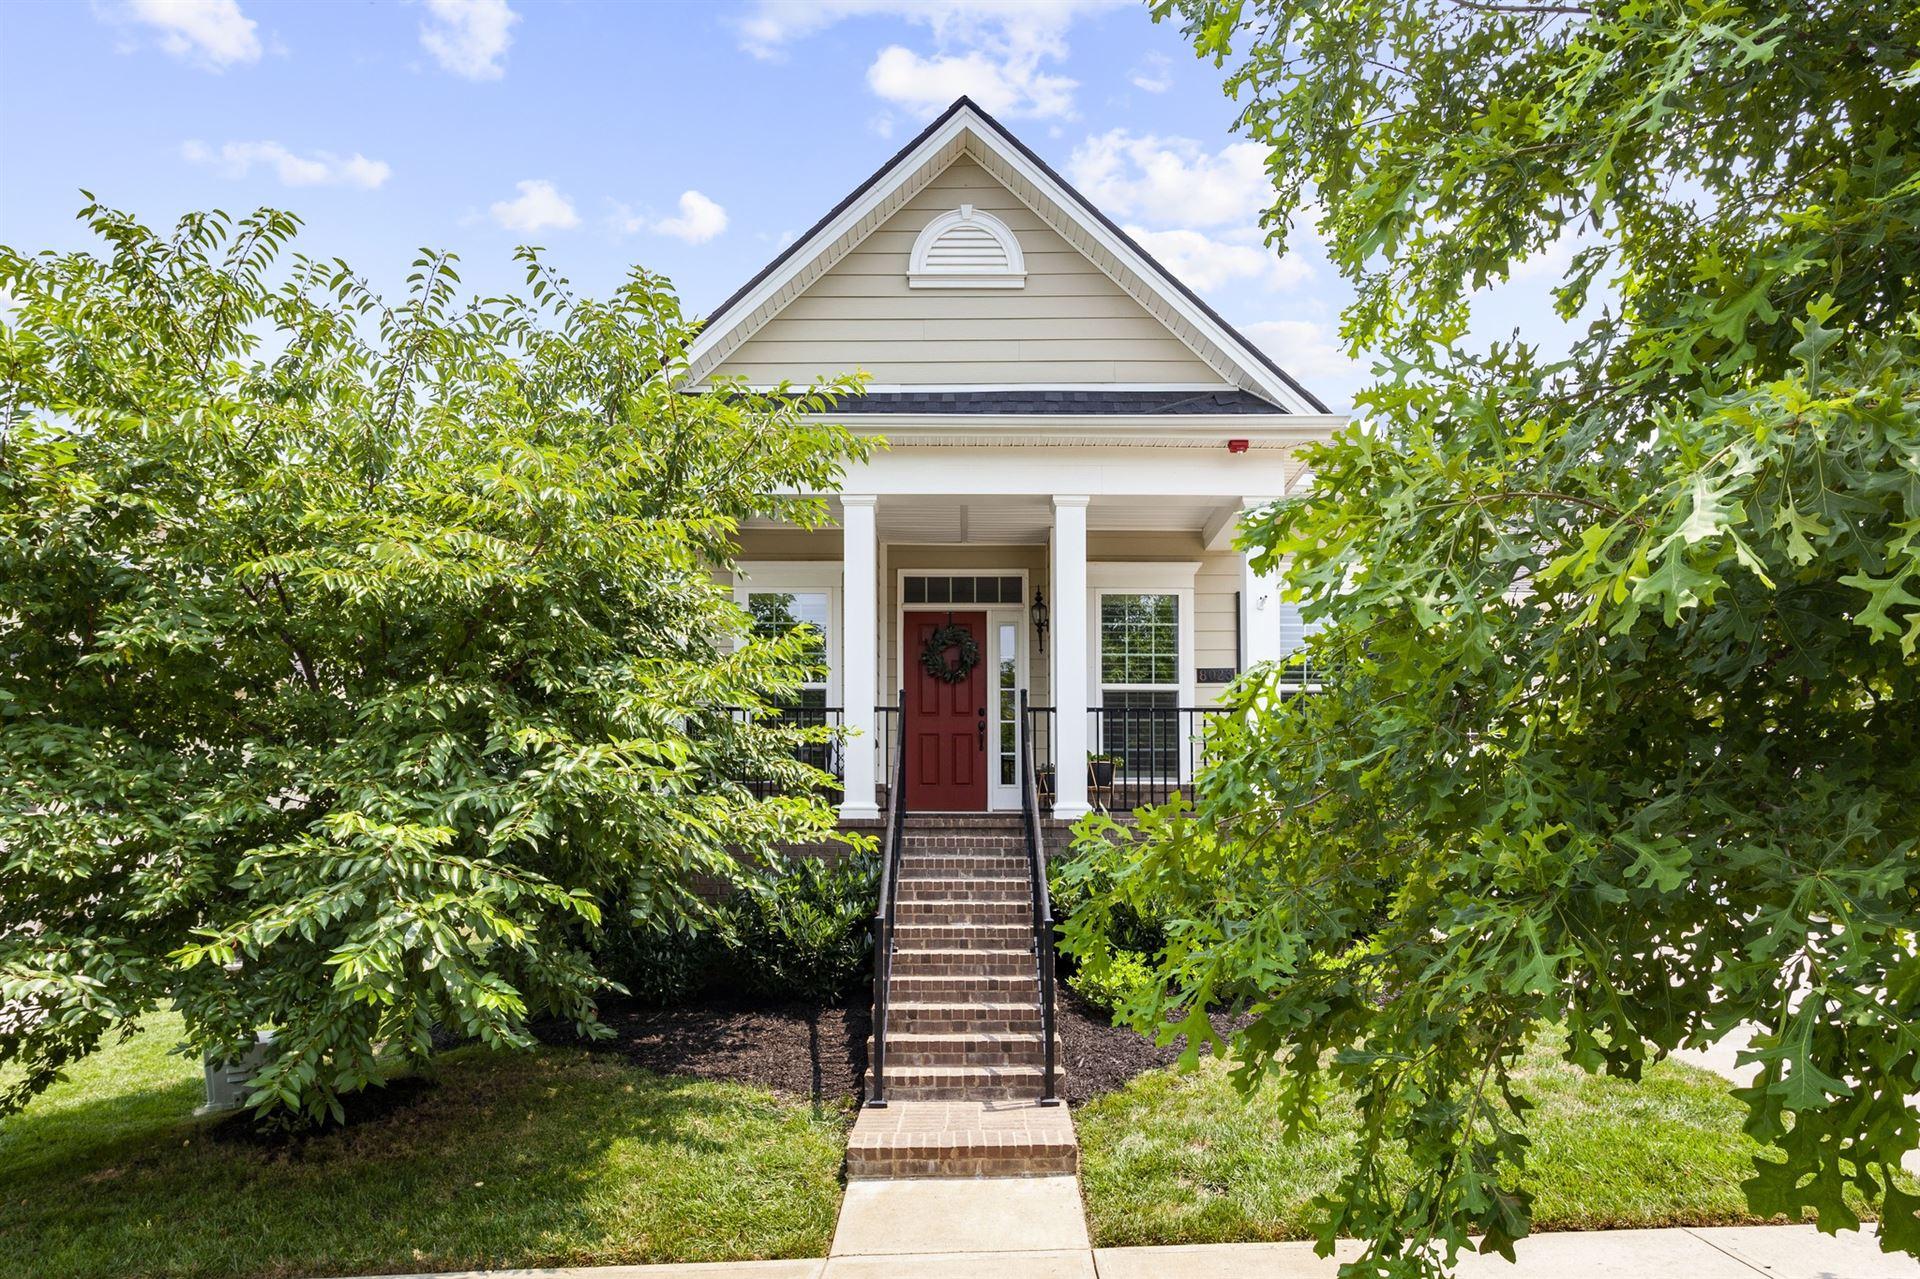 8023 Brookpark Ave, Franklin, TN 37064 - MLS#: 2275611